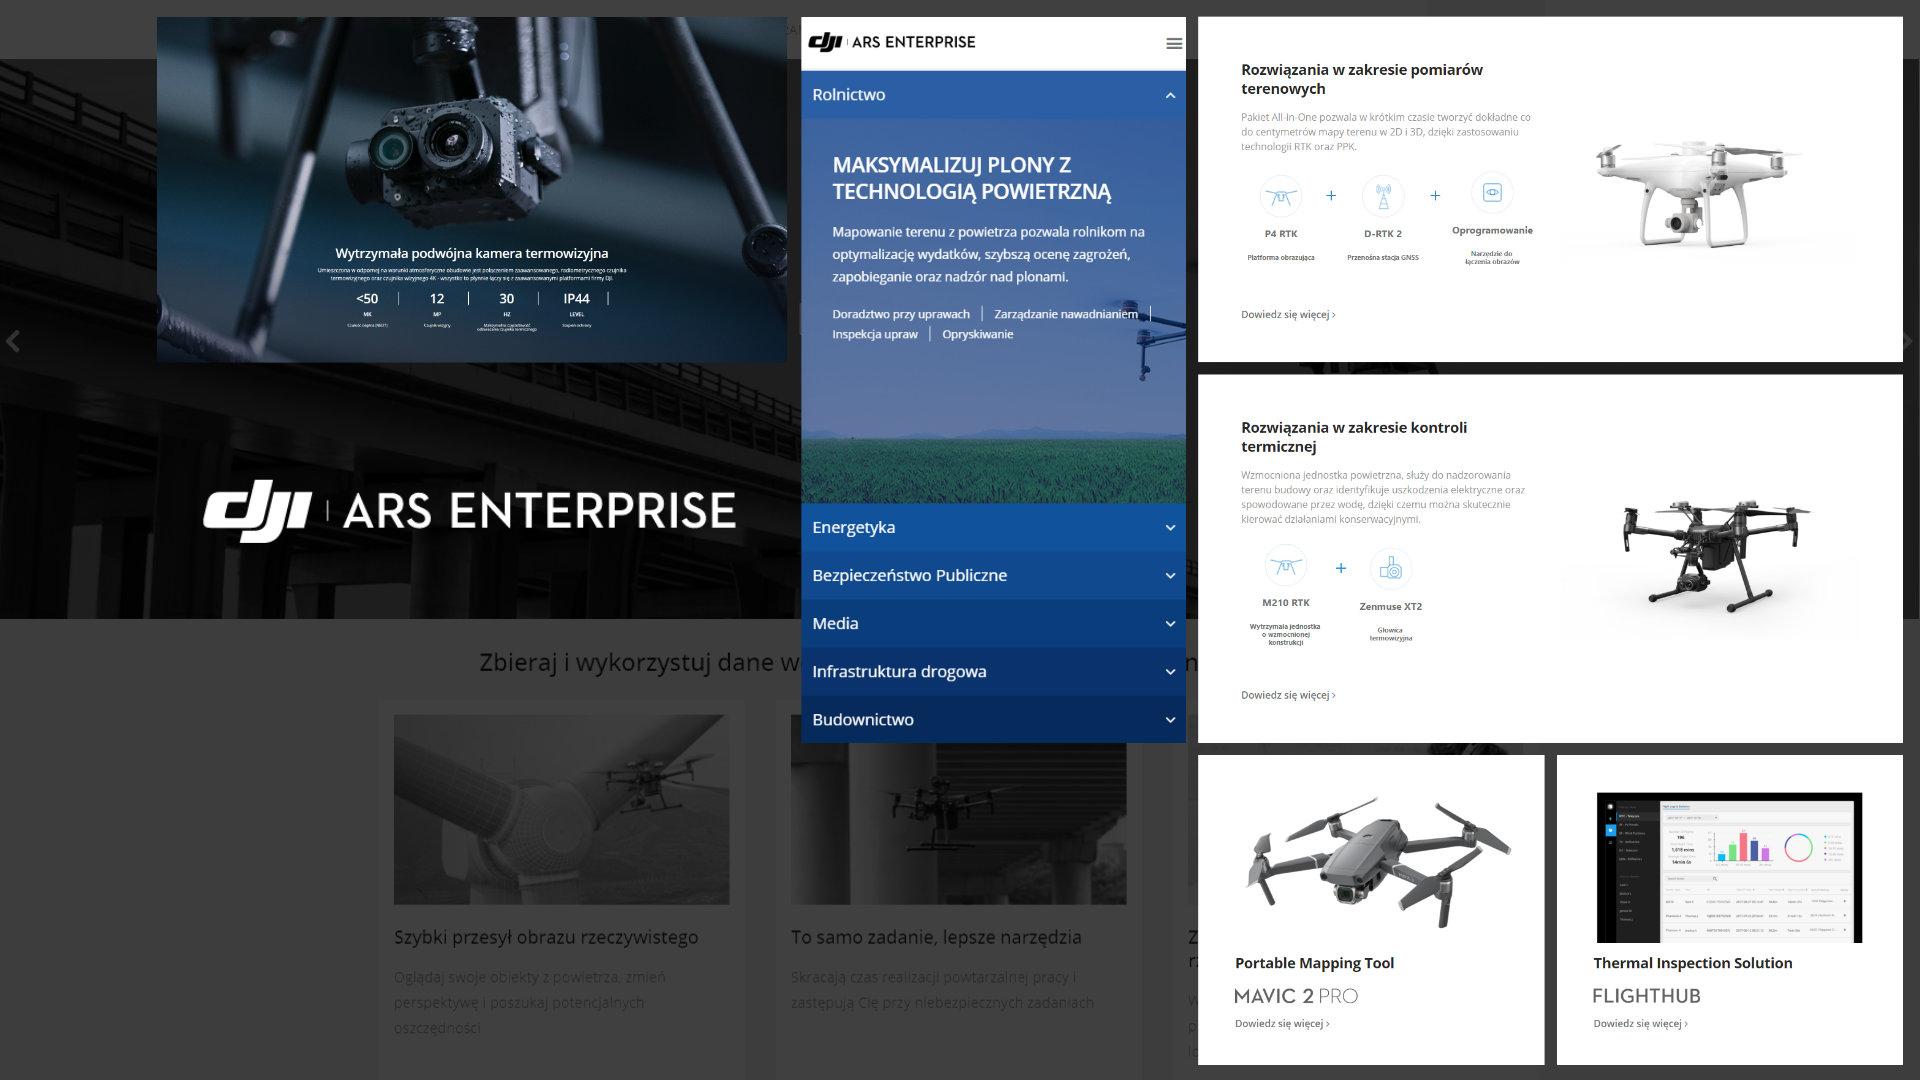 Enterprise DJI ARS